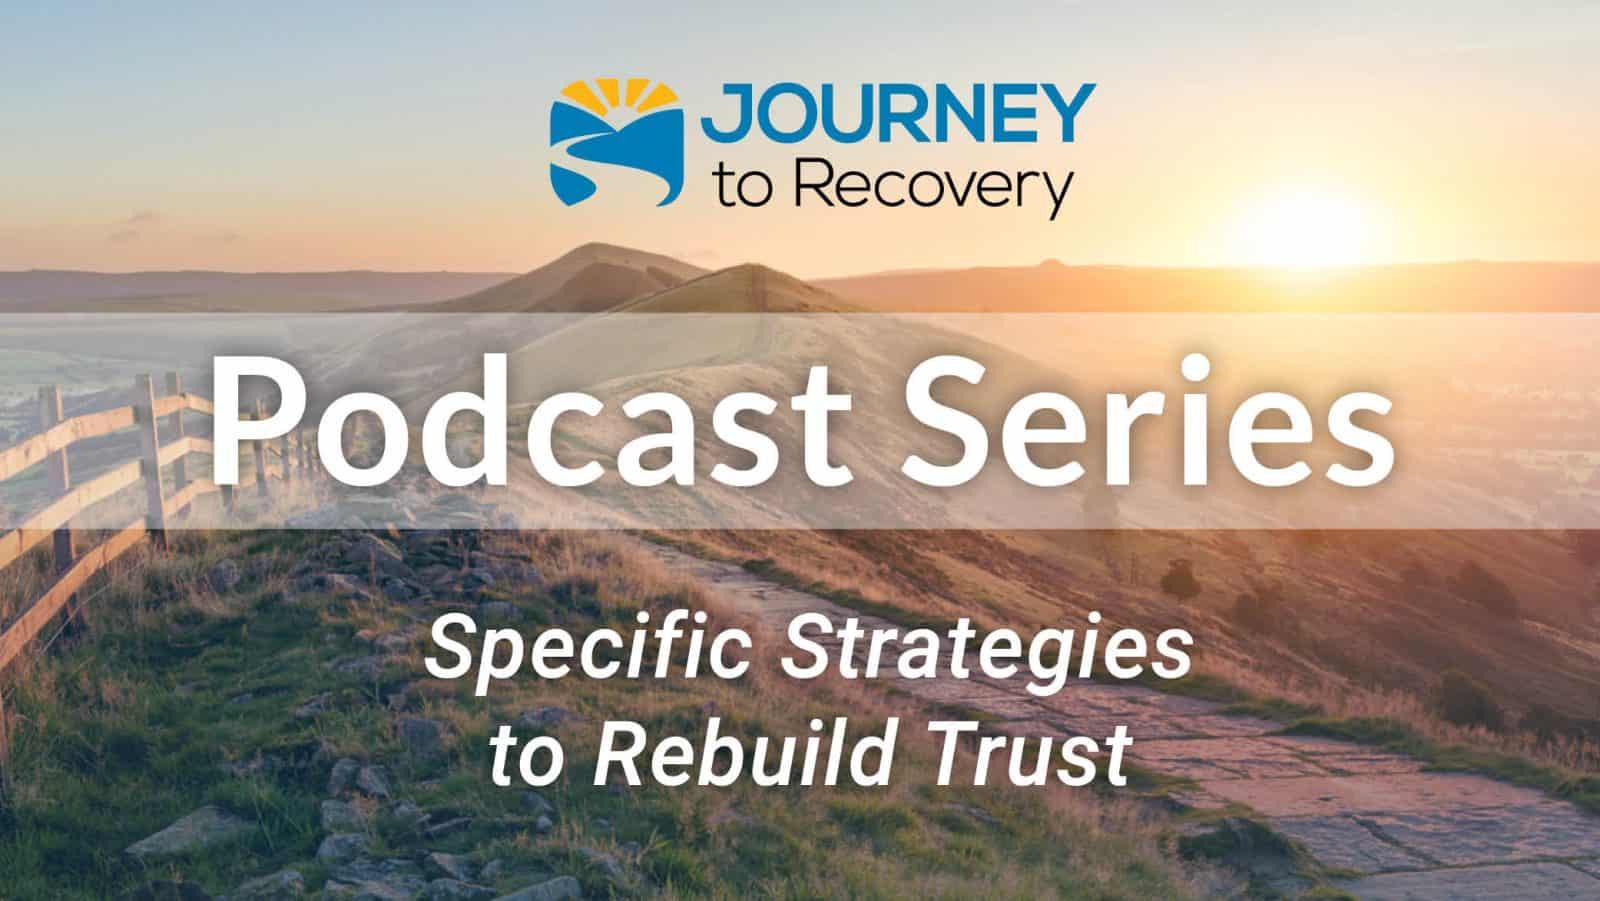 Specific Strategies to Rebuild Trust